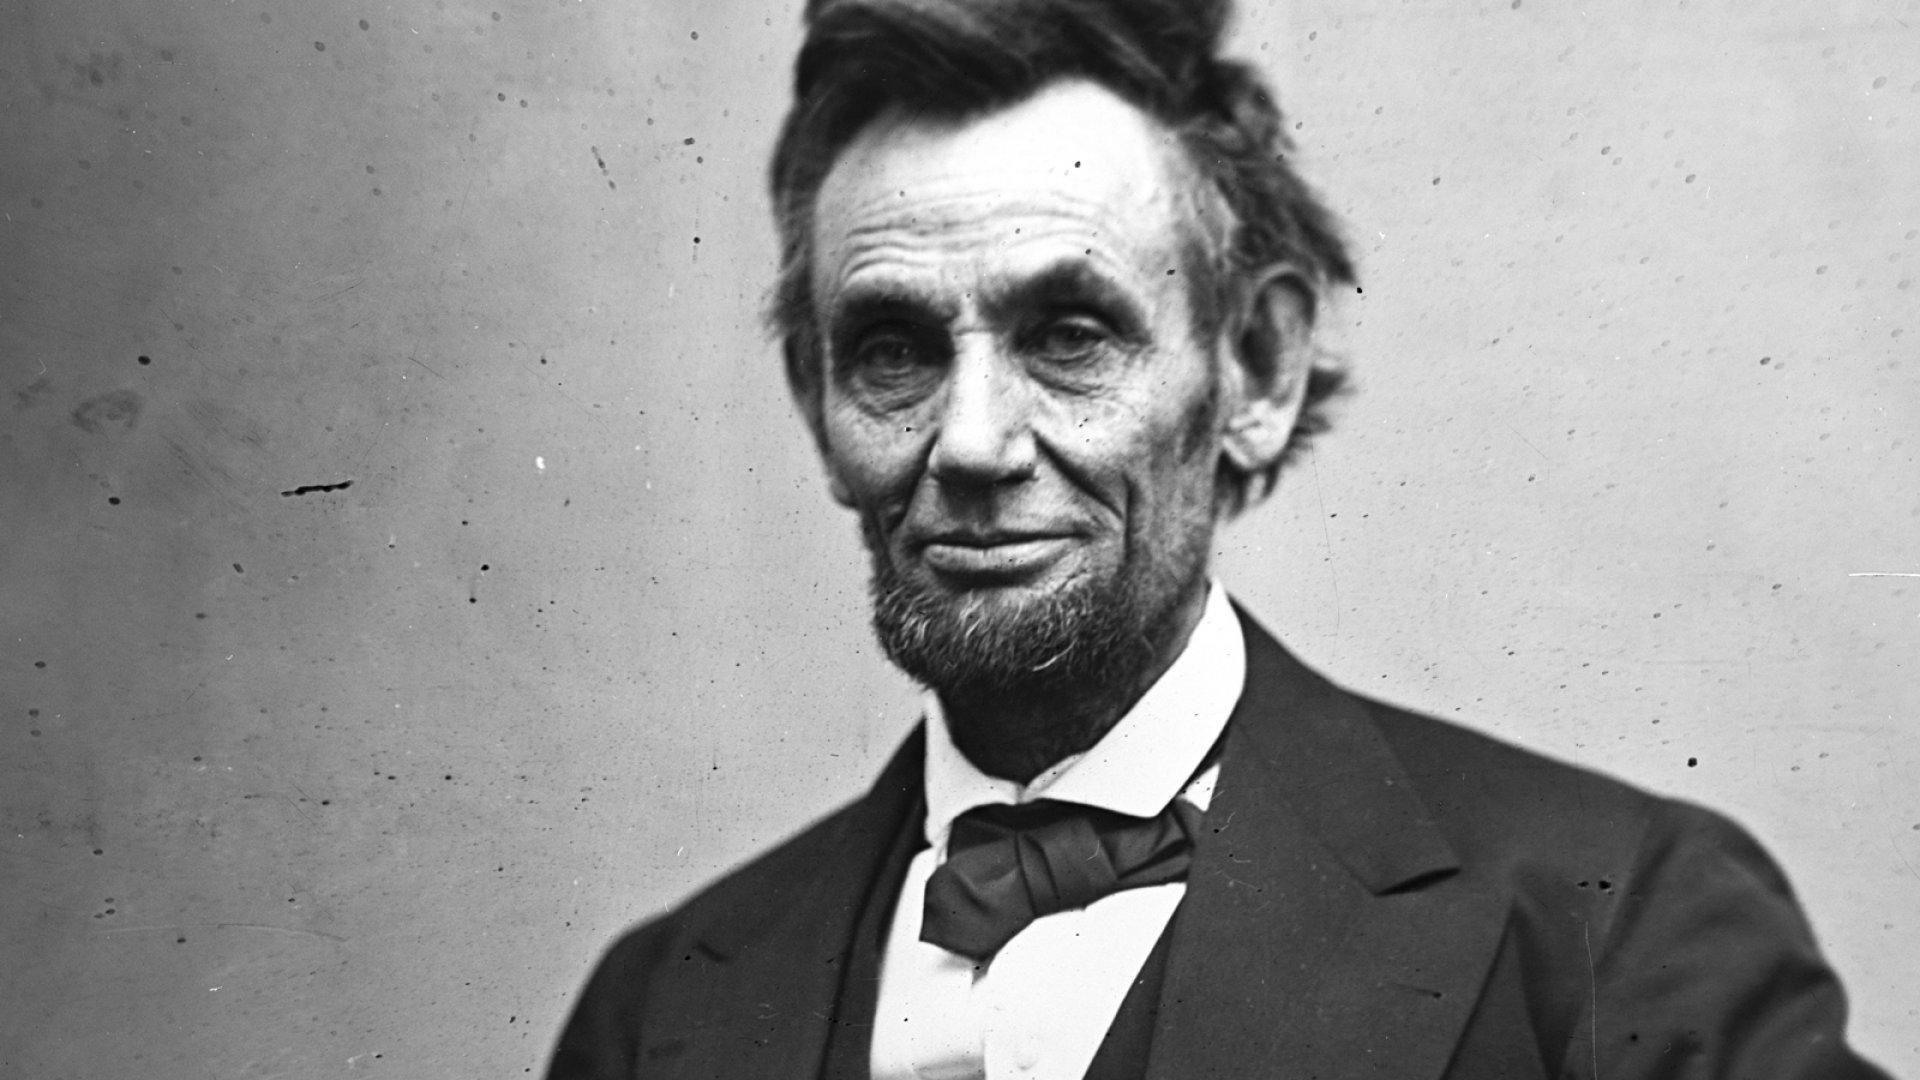 A Harvard Historian Reveals 7 Ways You Can Lead Like Abraham Lincoln | Inc.com